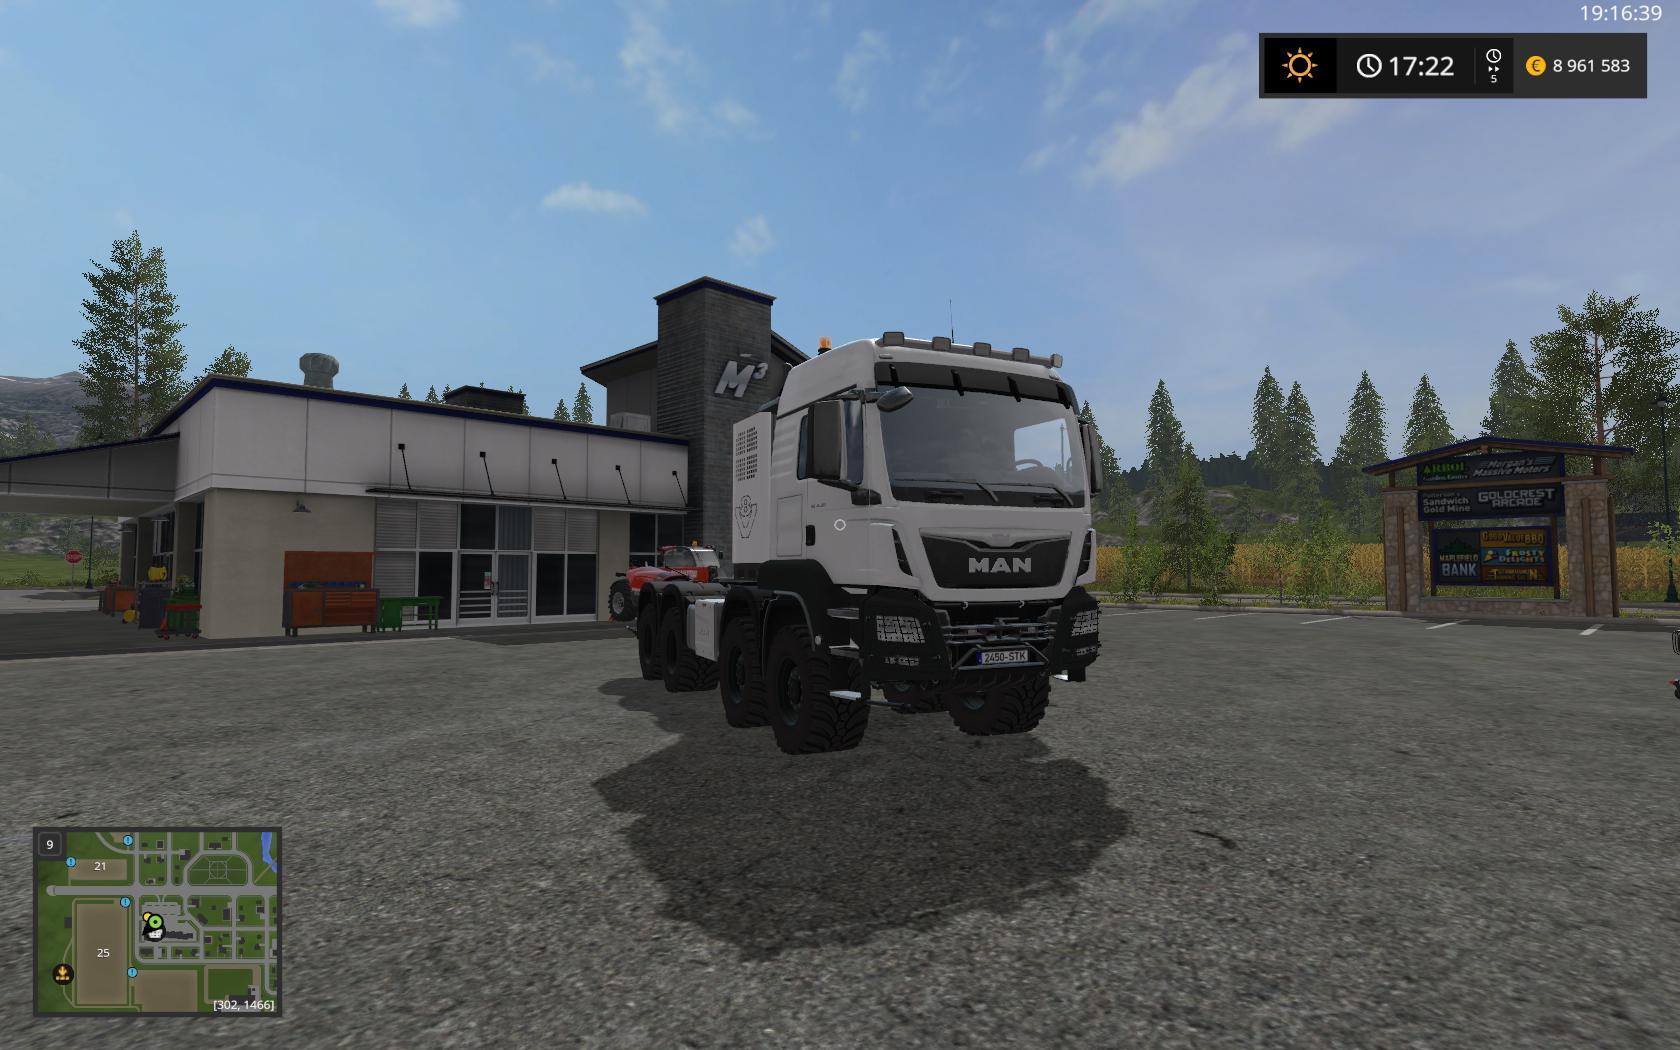 MAN TGS 4157 8X8 V2 TRUCK - Farming Simulator 17 mod / FS